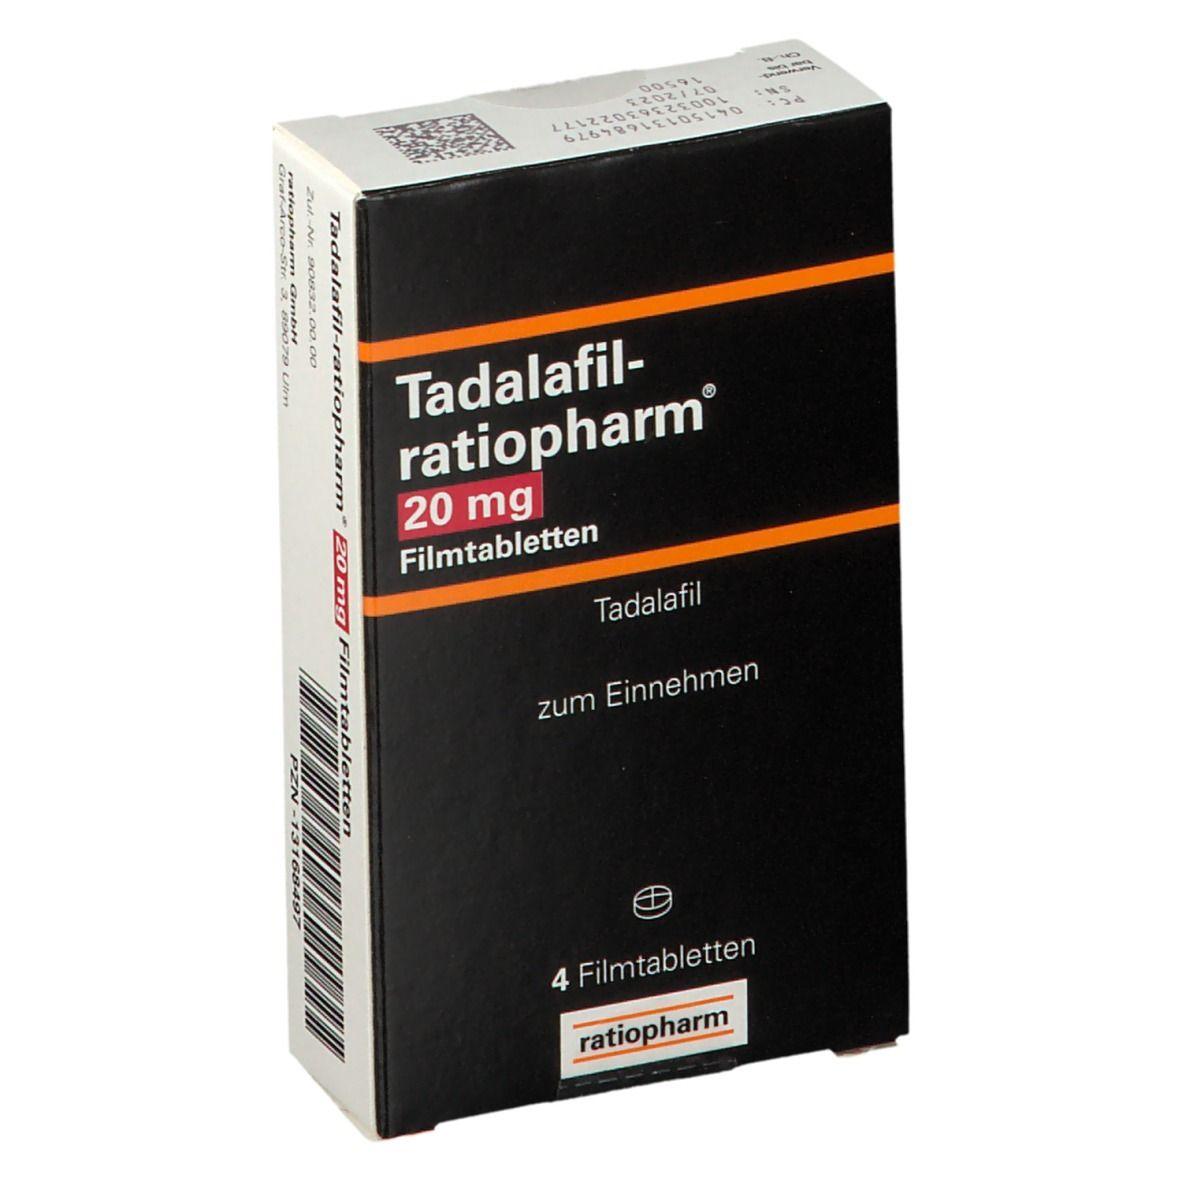 TADALAFIL-ratiopharm® 20 mg Filmtabletten